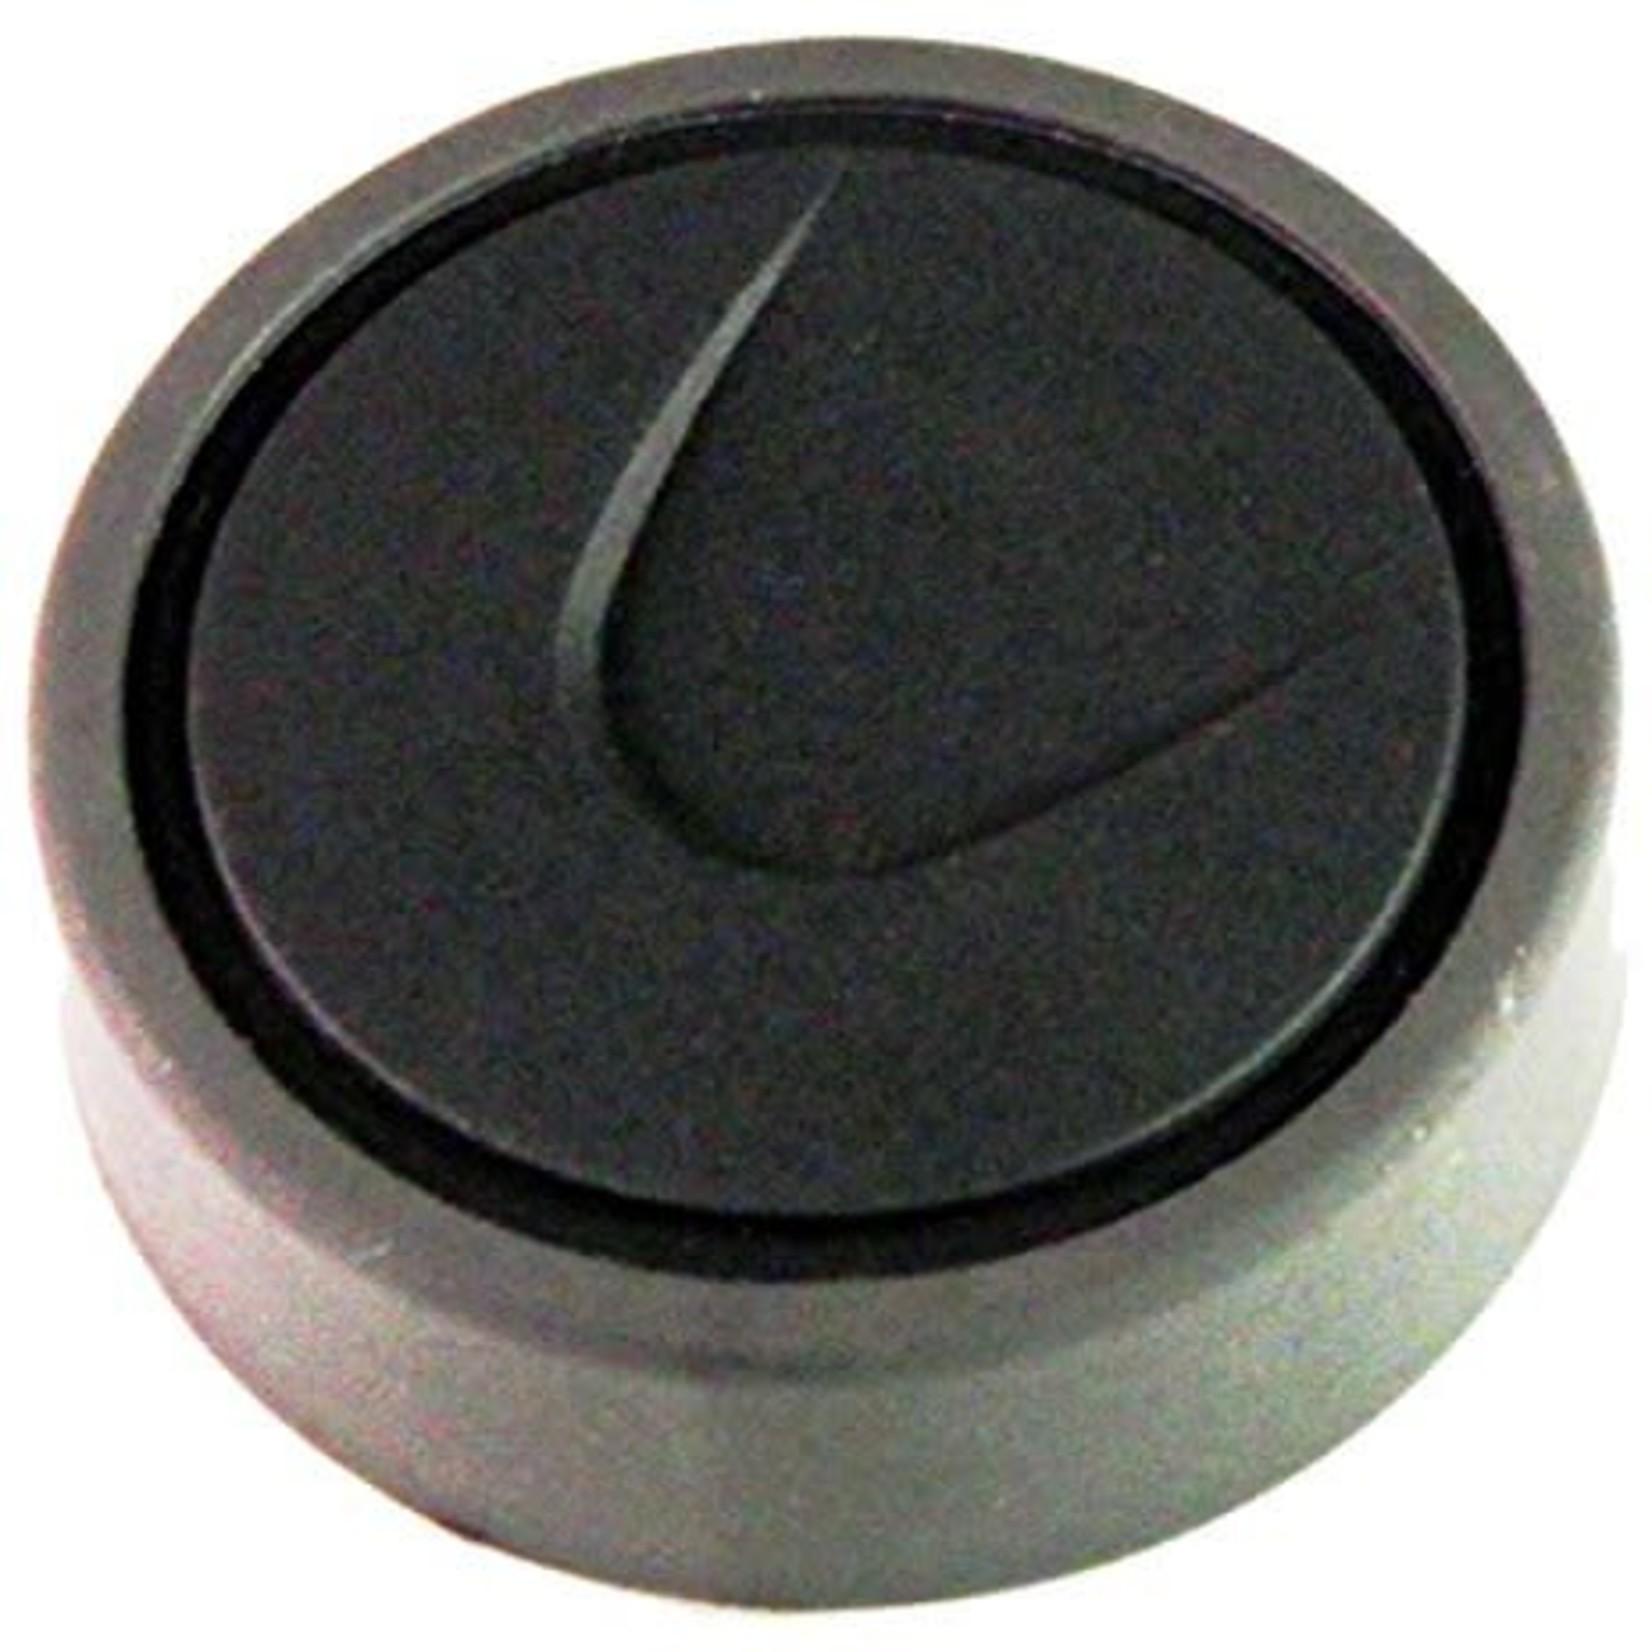 Centec CenTec Rear Wheel for CT20DXQD